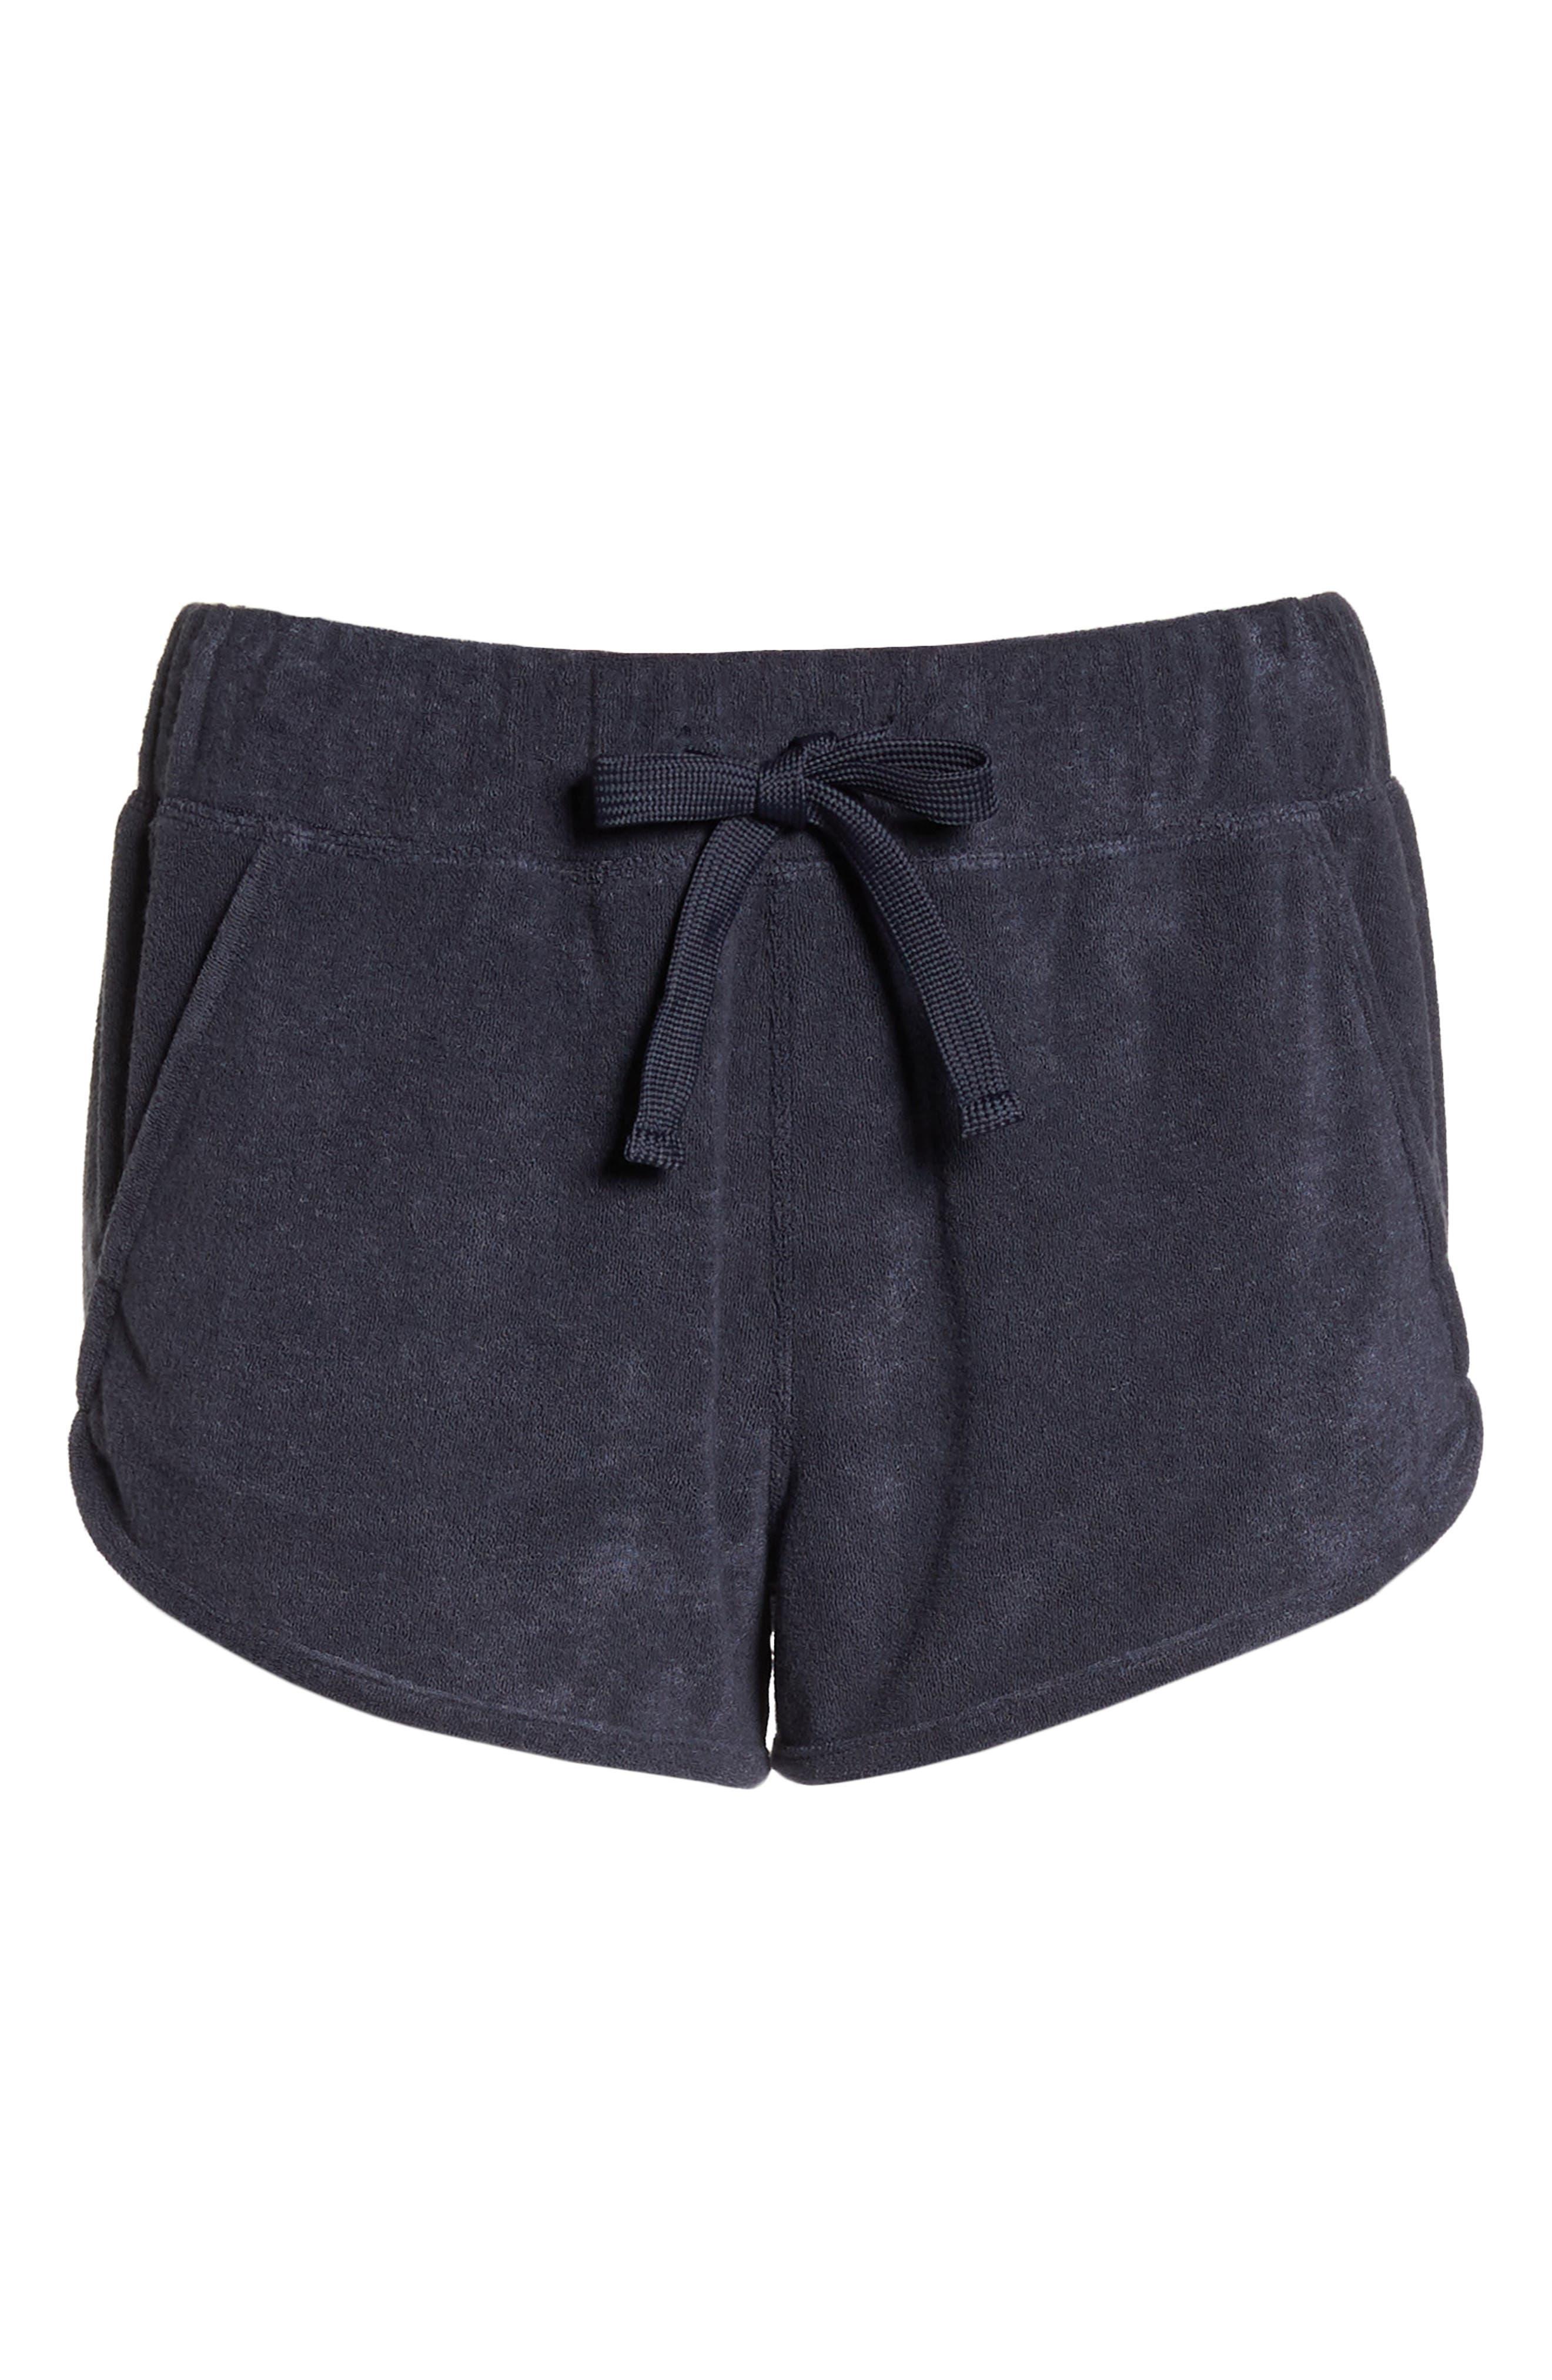 Spa Shorts,                             Alternate thumbnail 7, color,                             021